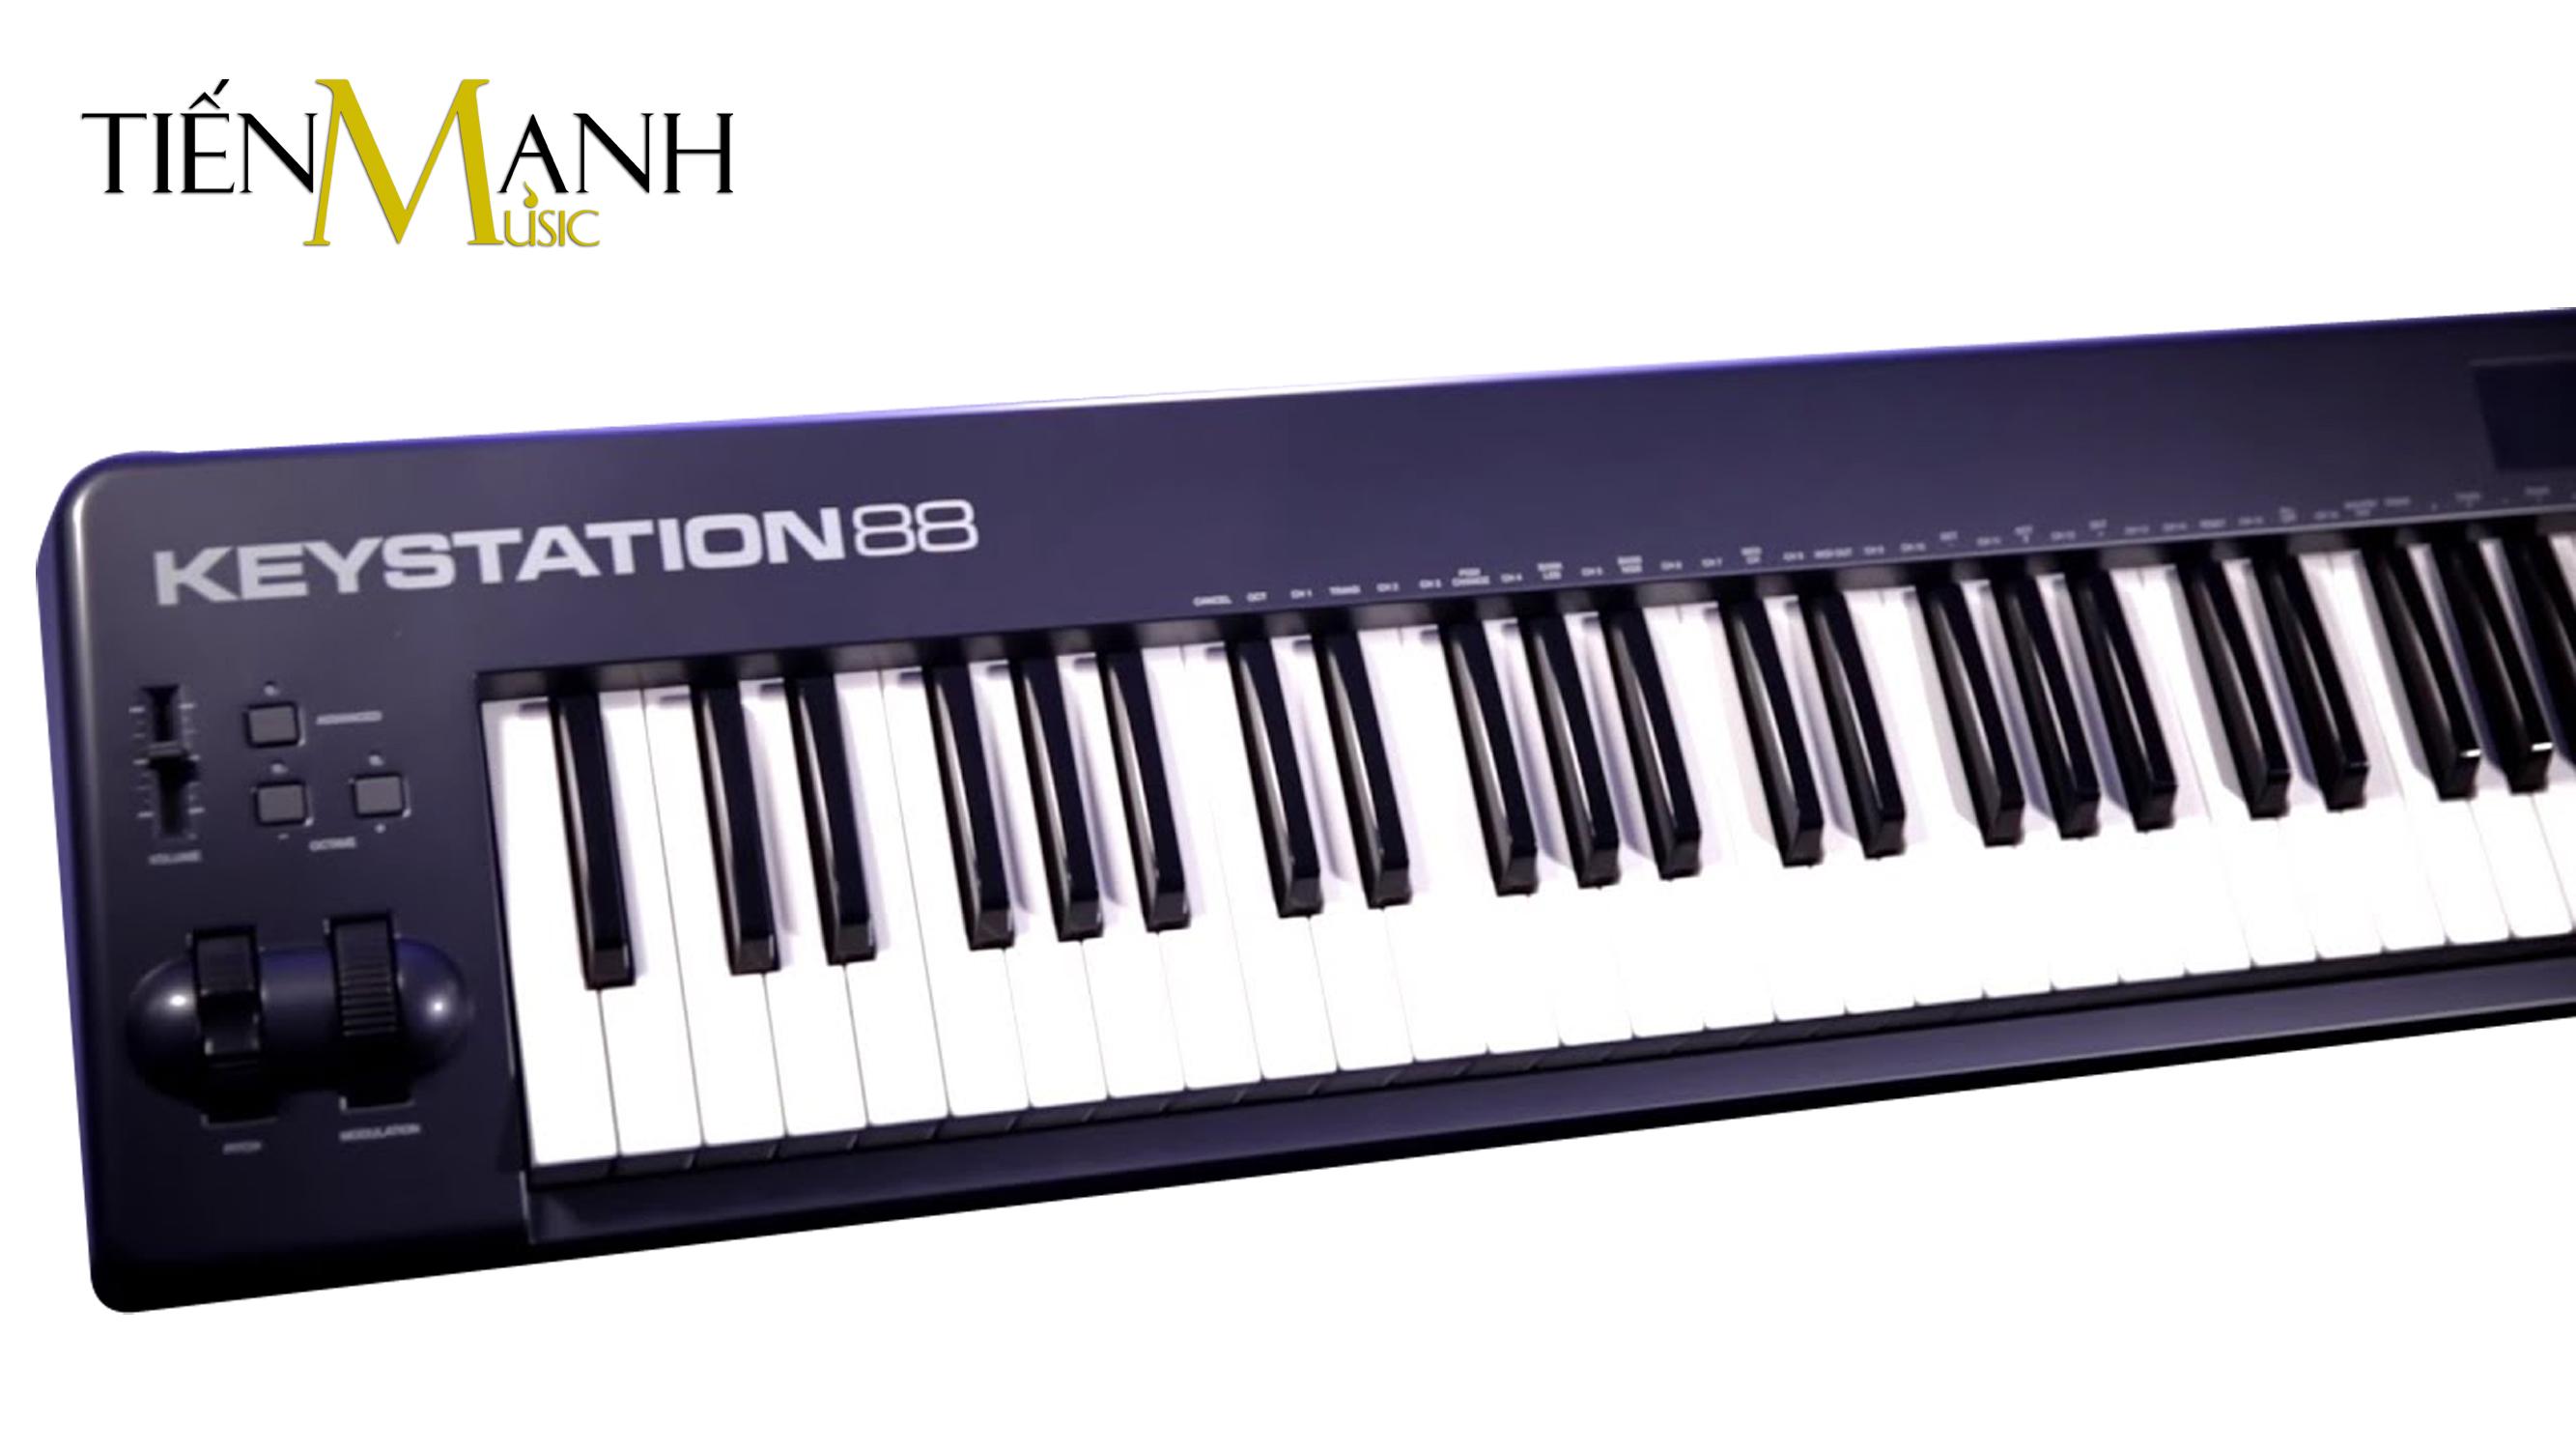 M-Audio Keystation88 MIDI Controller